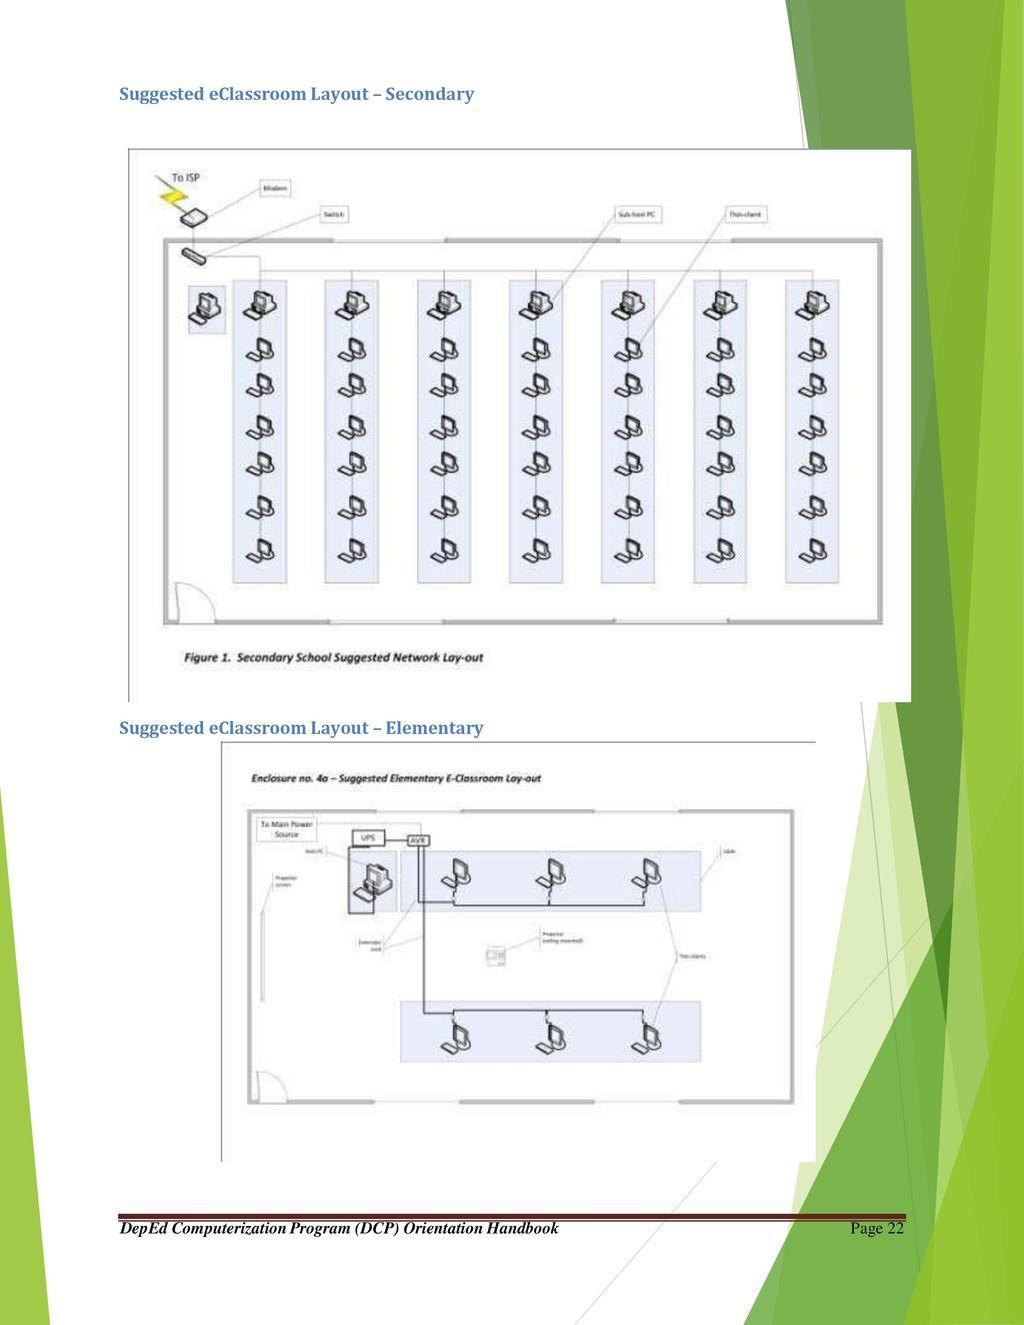 Computerization Program Dcp Orientation Handbook Ppt Download